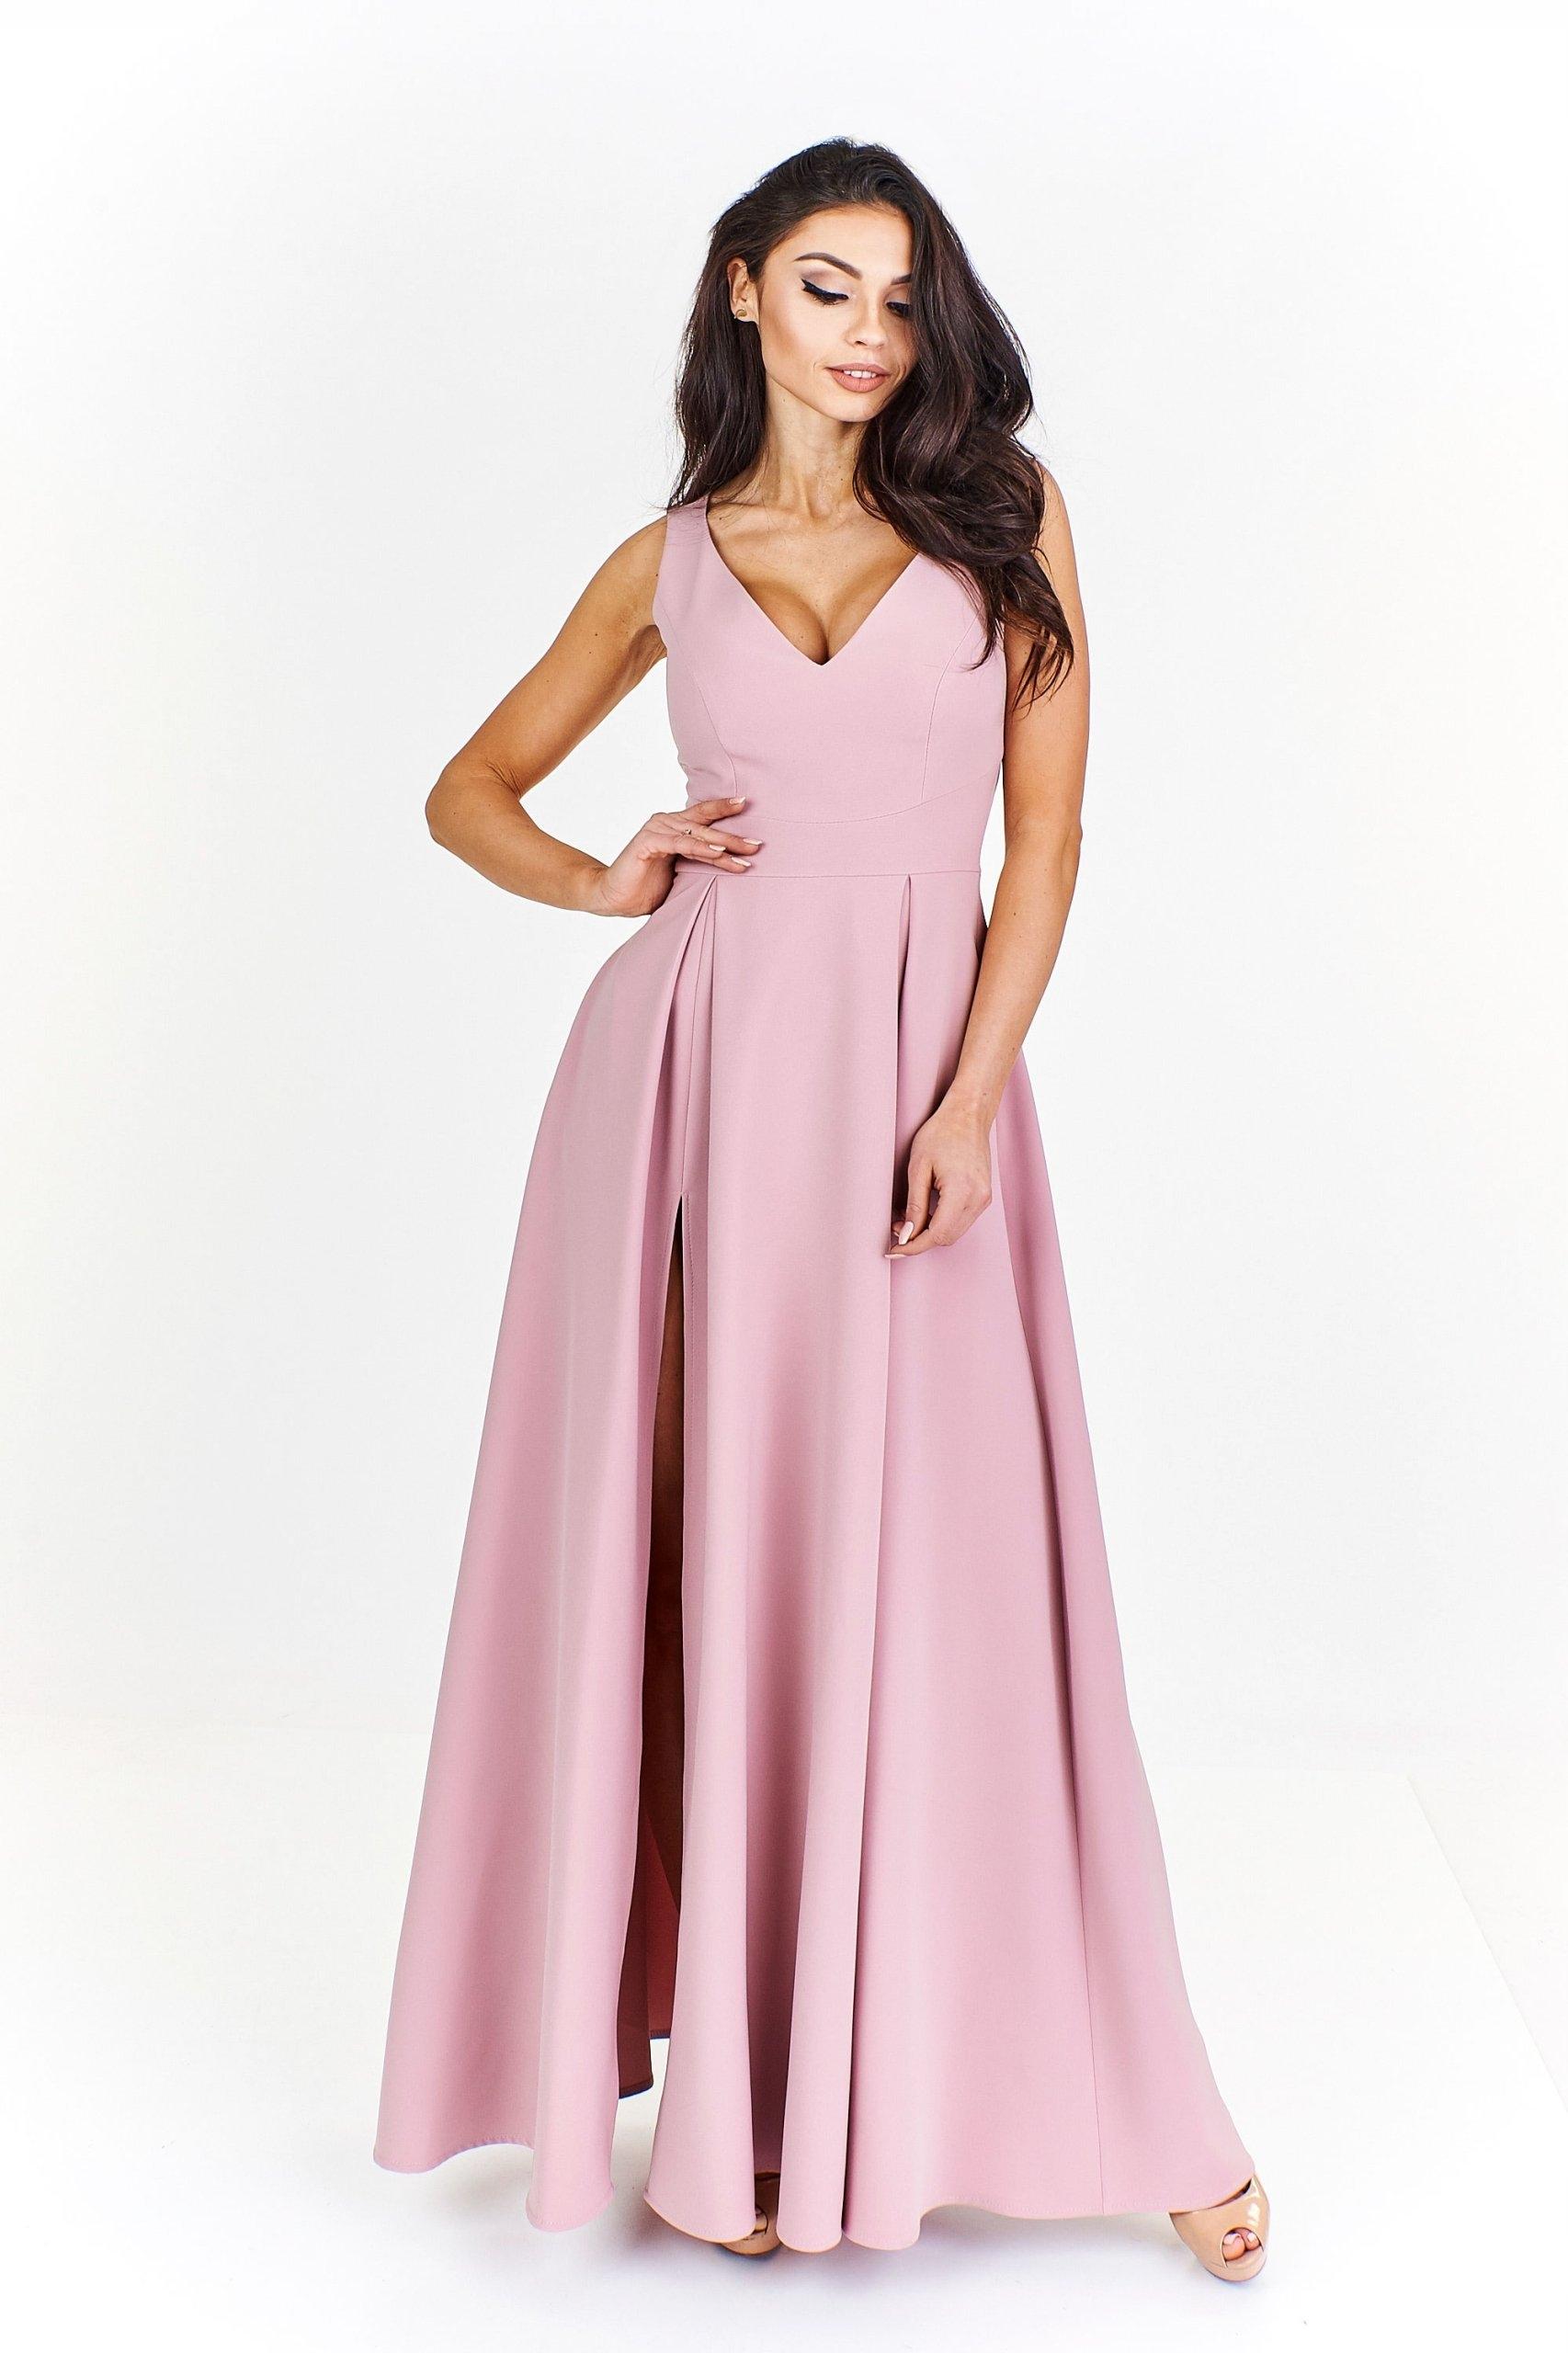 db614991d8e68a Długa sukienka maxi z dekoltem w serek.Wesele M - 7376799163 ...